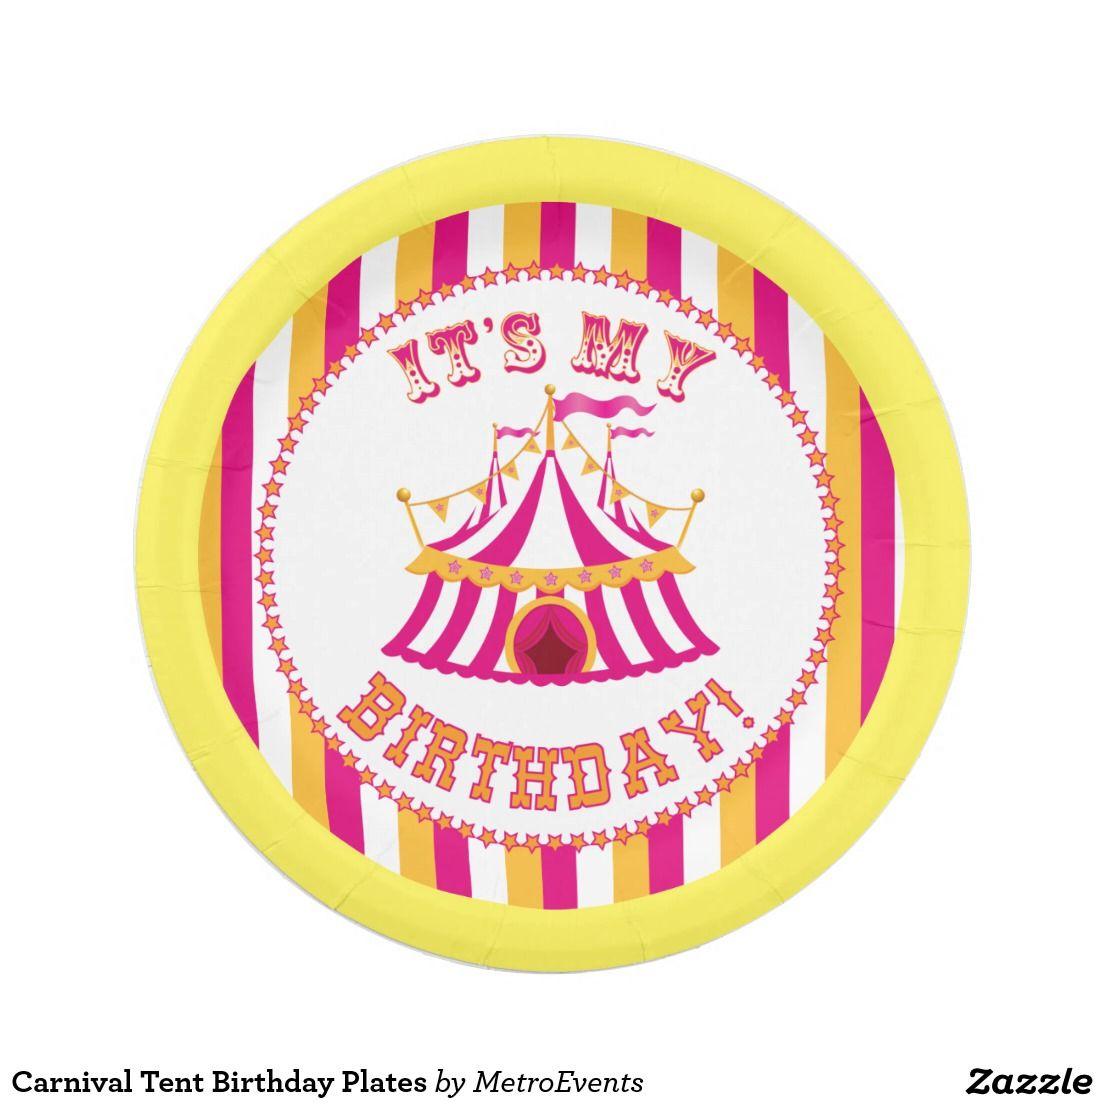 Carnival Tent Birthday Plates